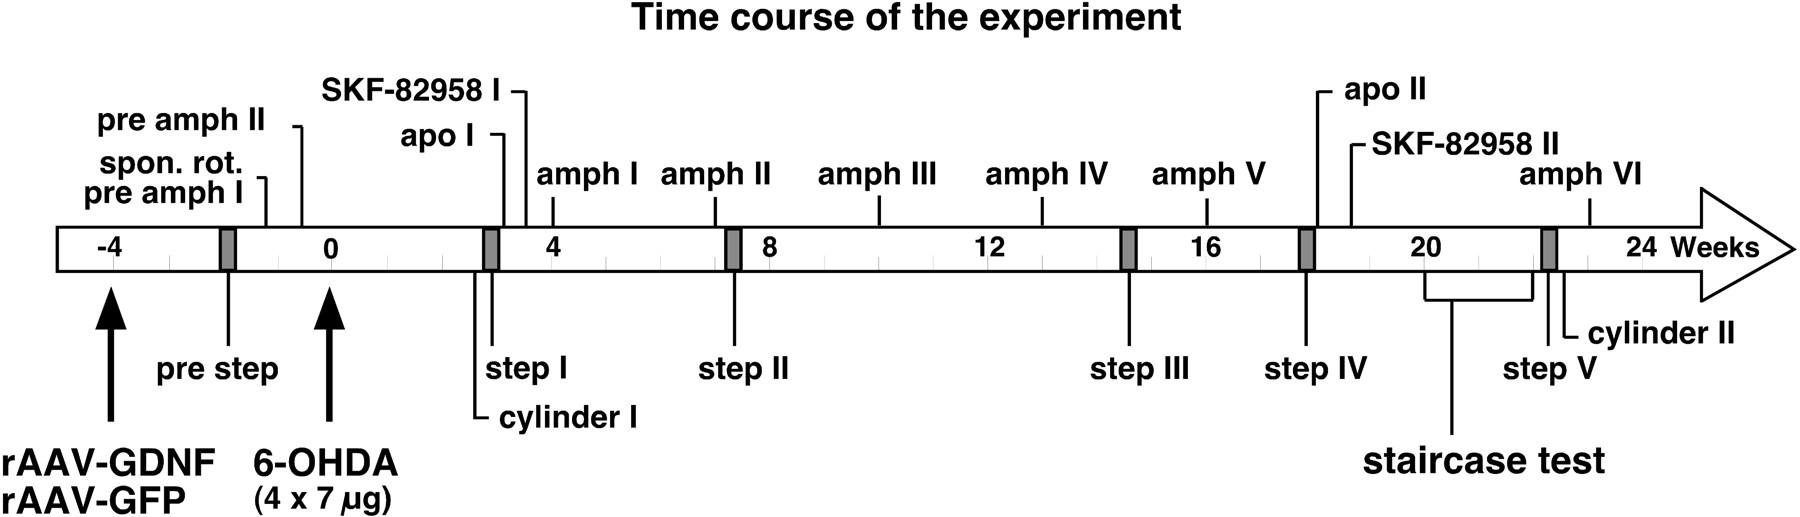 Long-Term rAAV-Mediated Gene Transfer of GDNF in the Rat